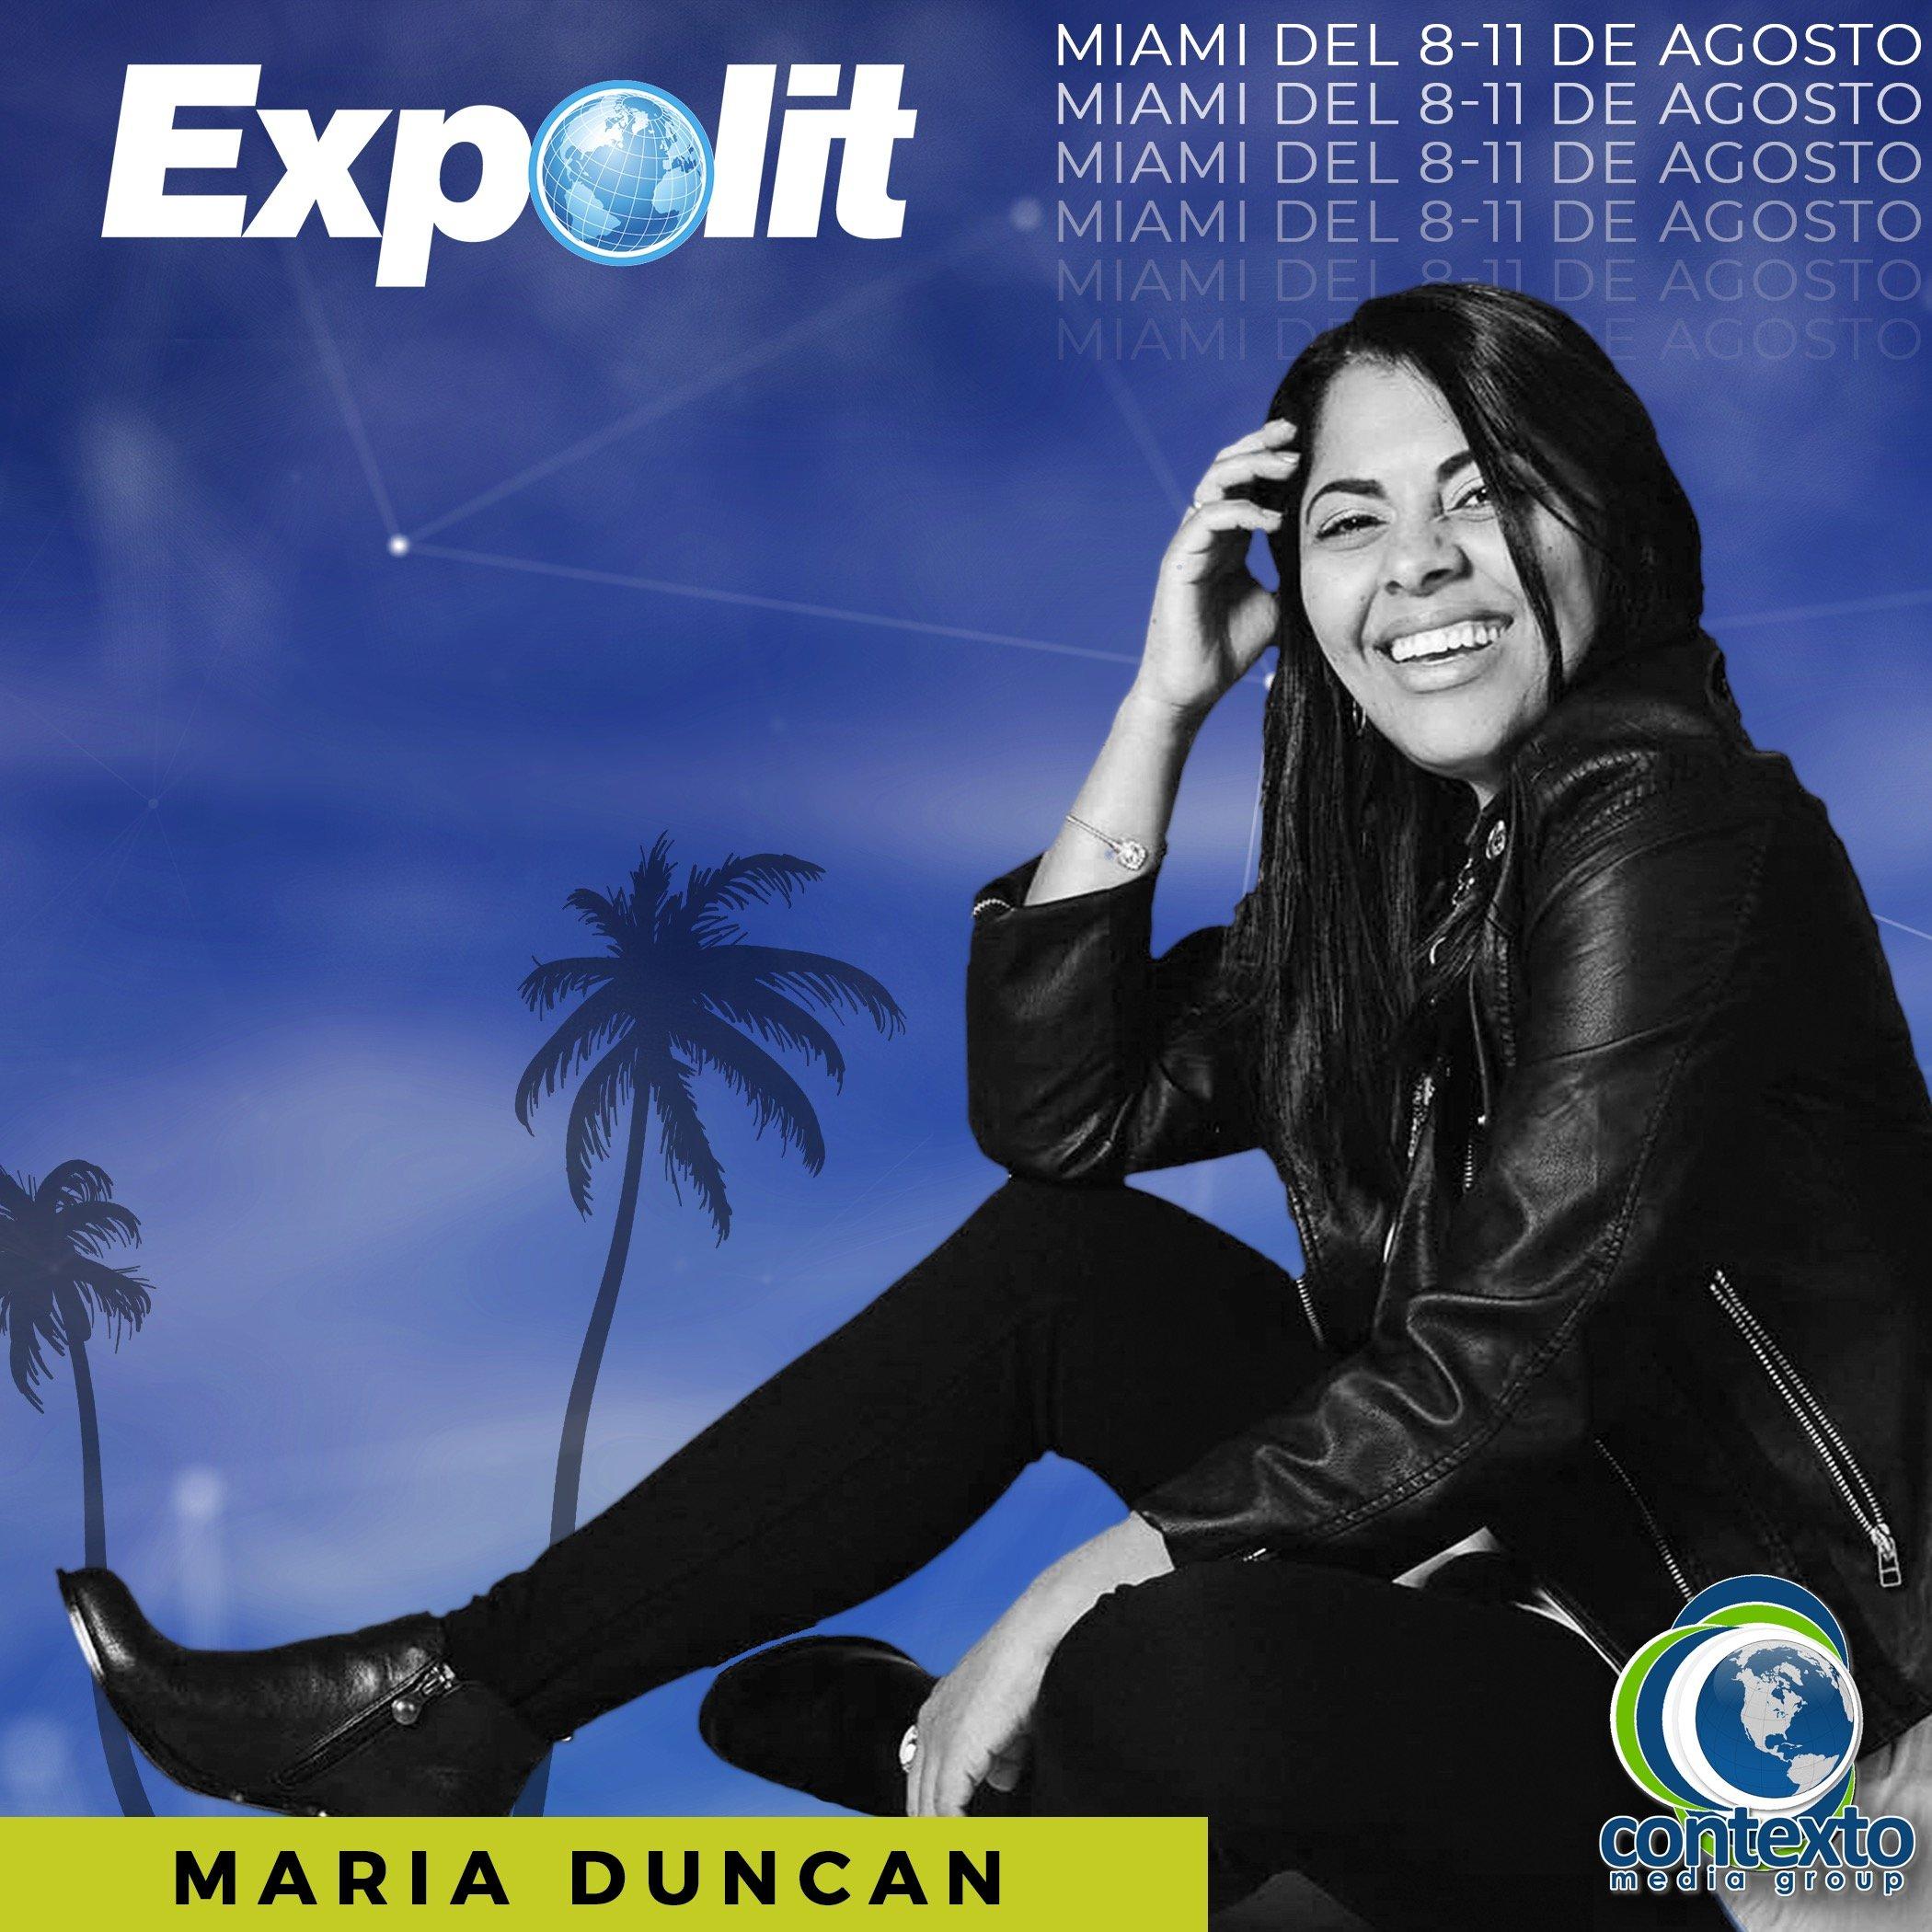 María Colina Duncan